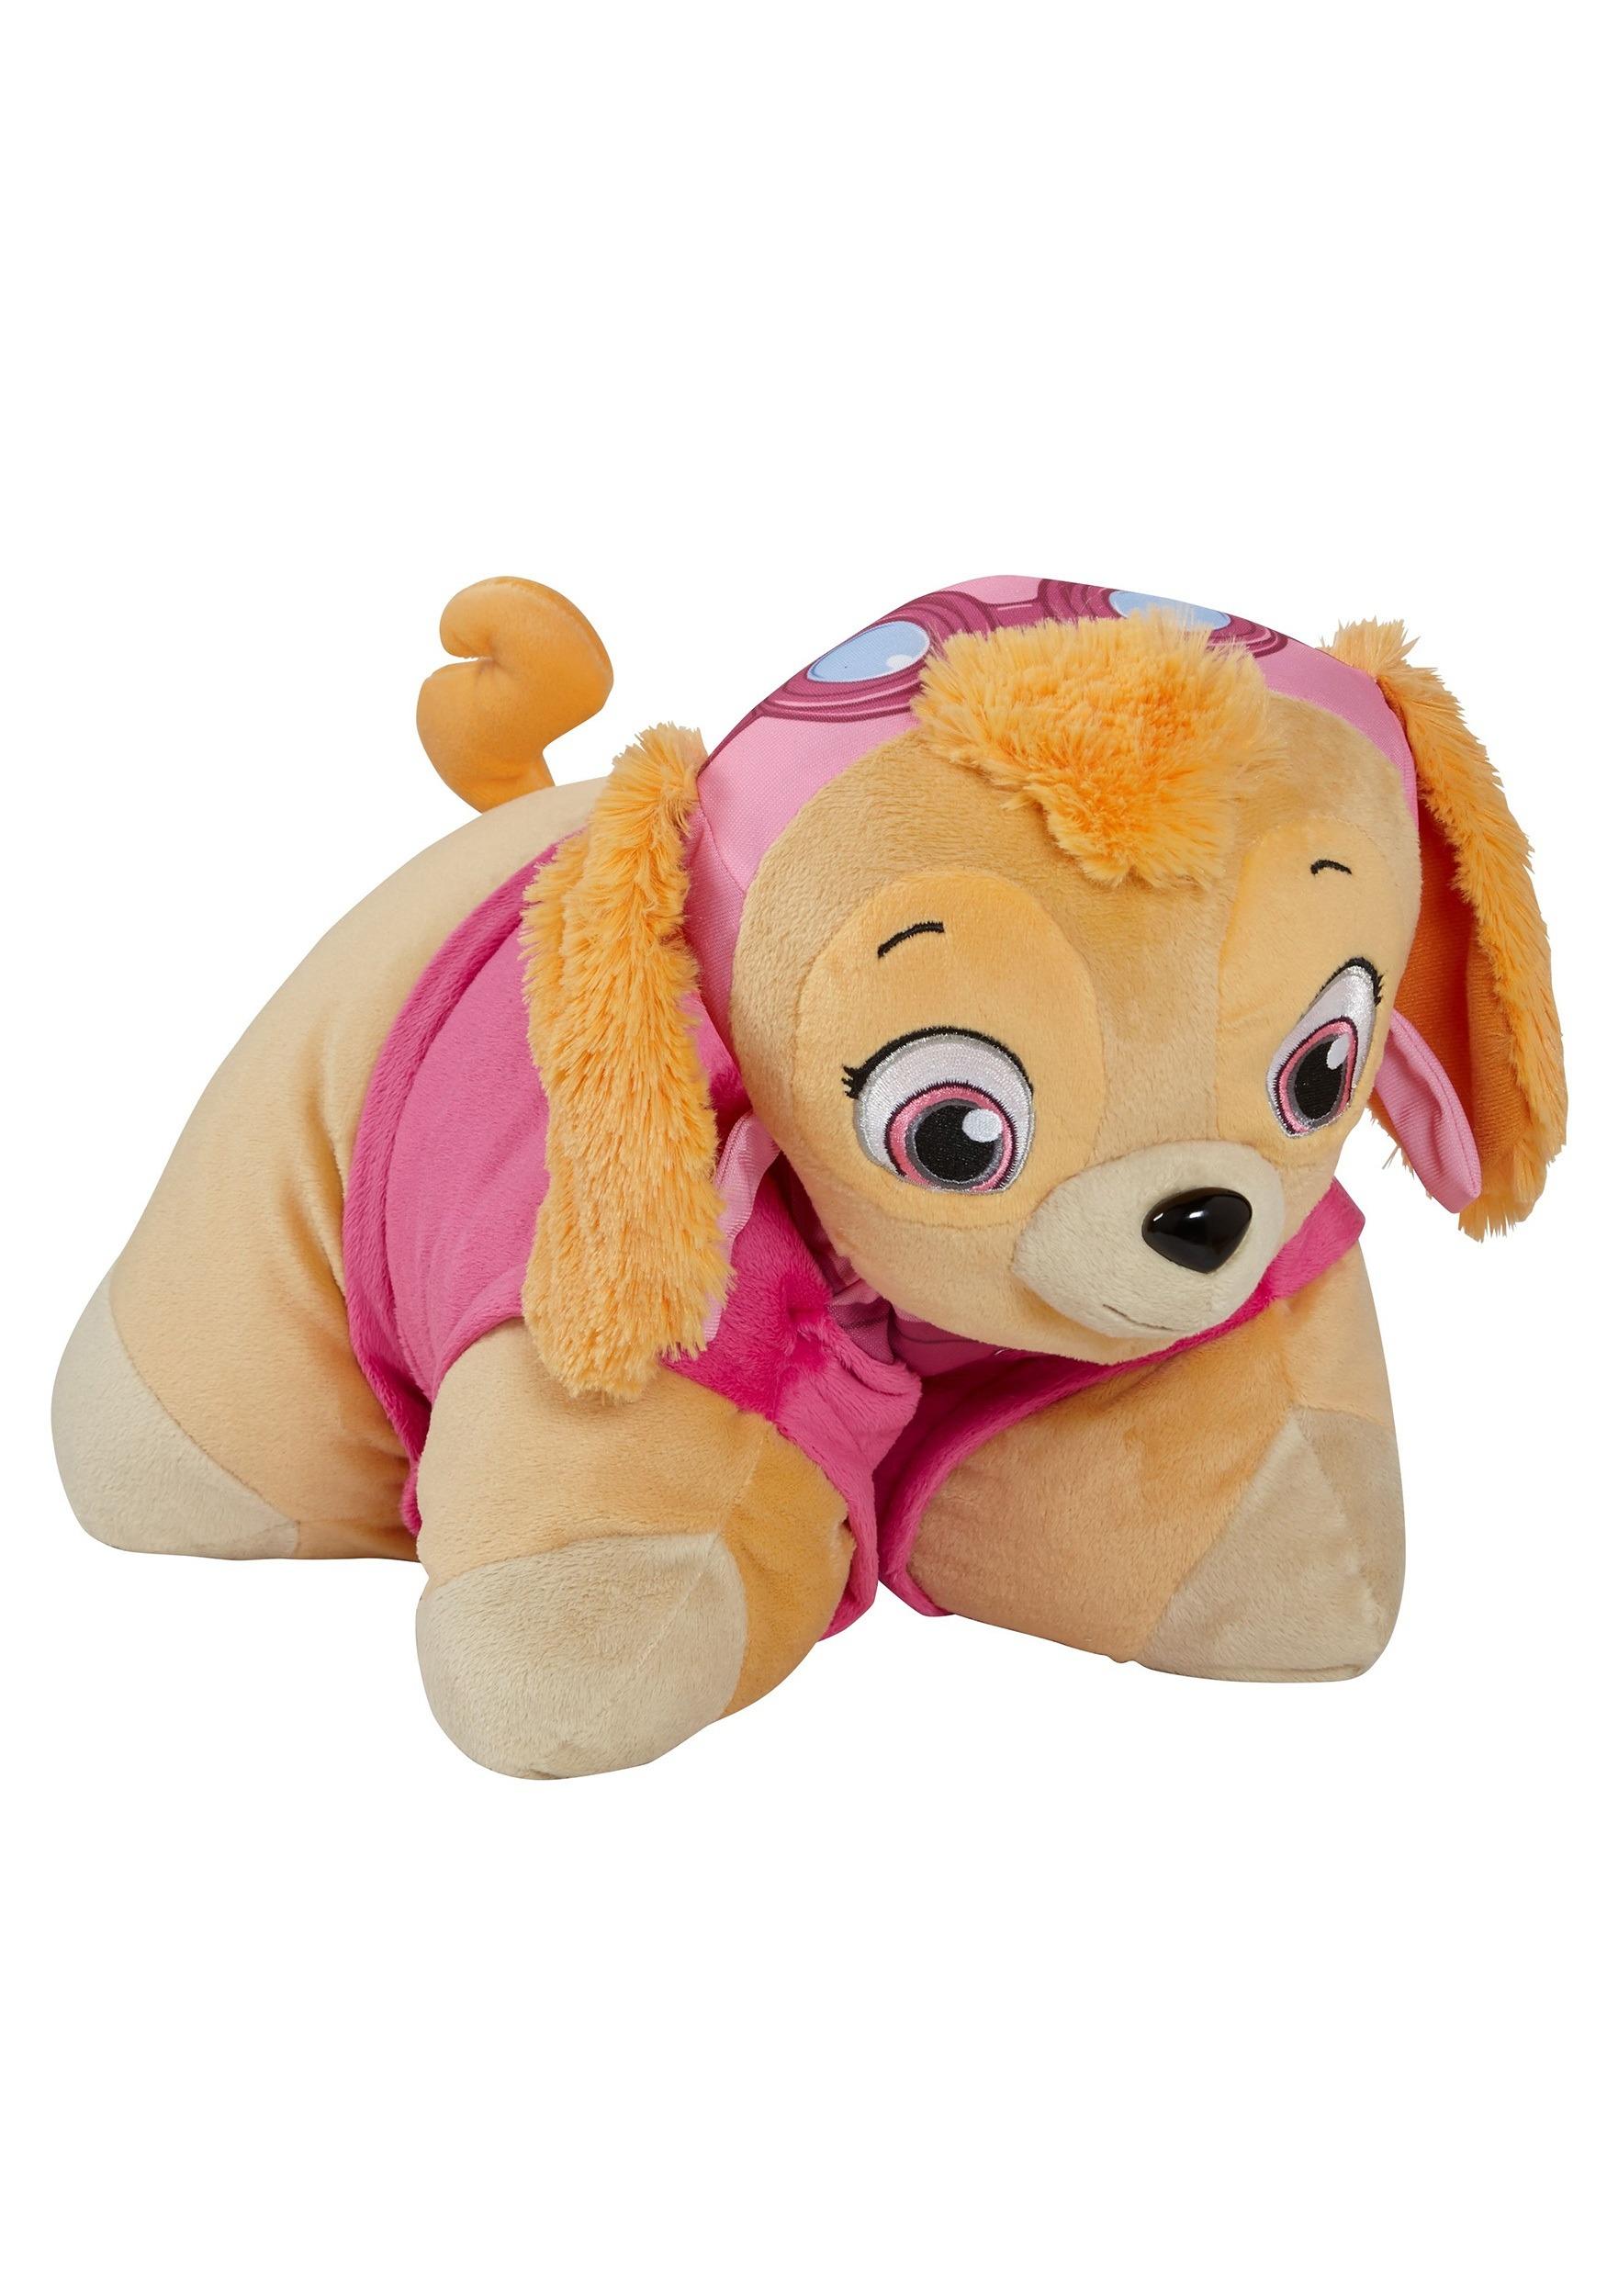 Paw Patrol Pillow Pets £5 at Poundland